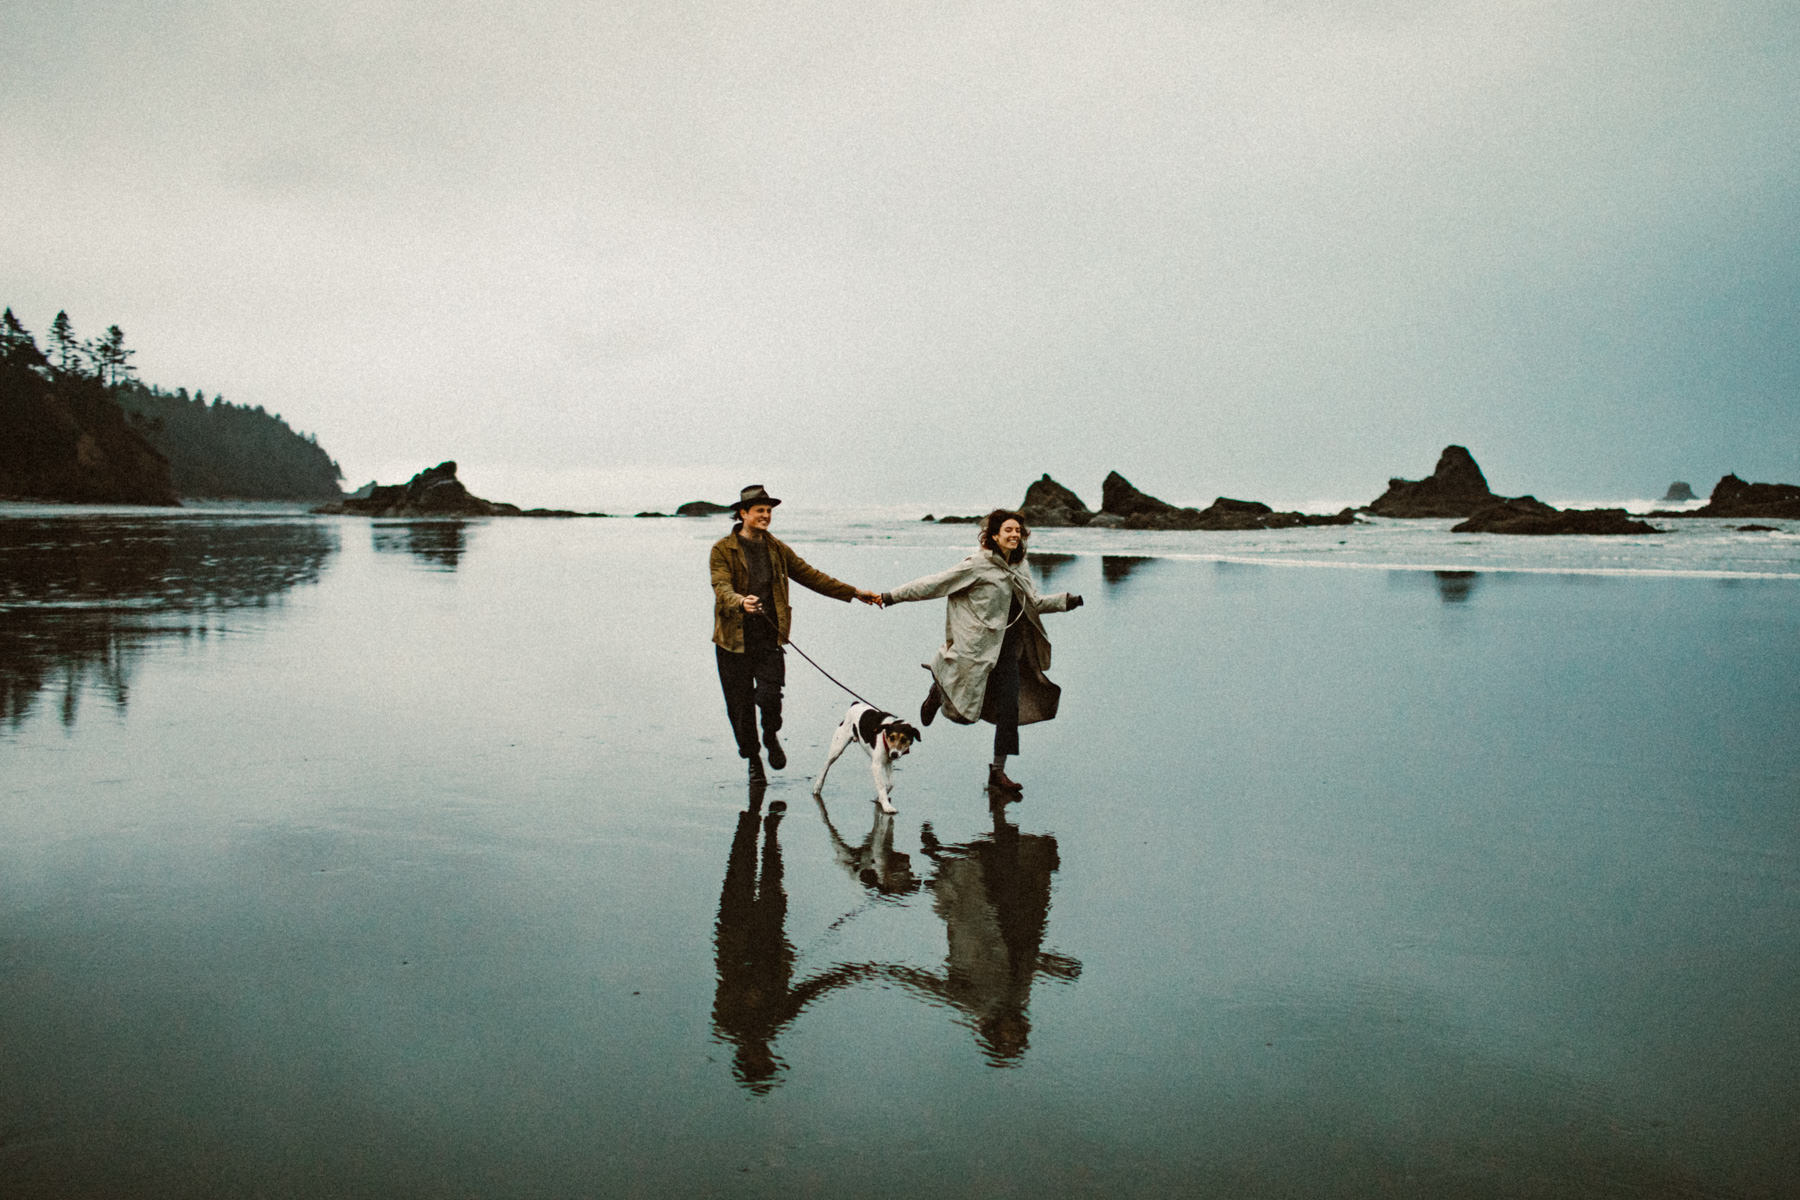 ruby-beach-1924us-engagement-photos-5.jpg